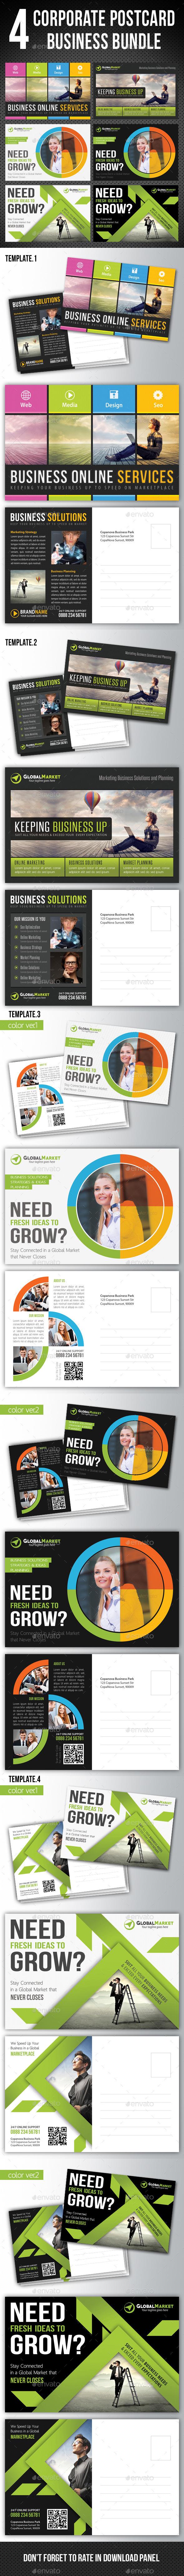 4 in 1 Corporate Business Postcard Bundle V01